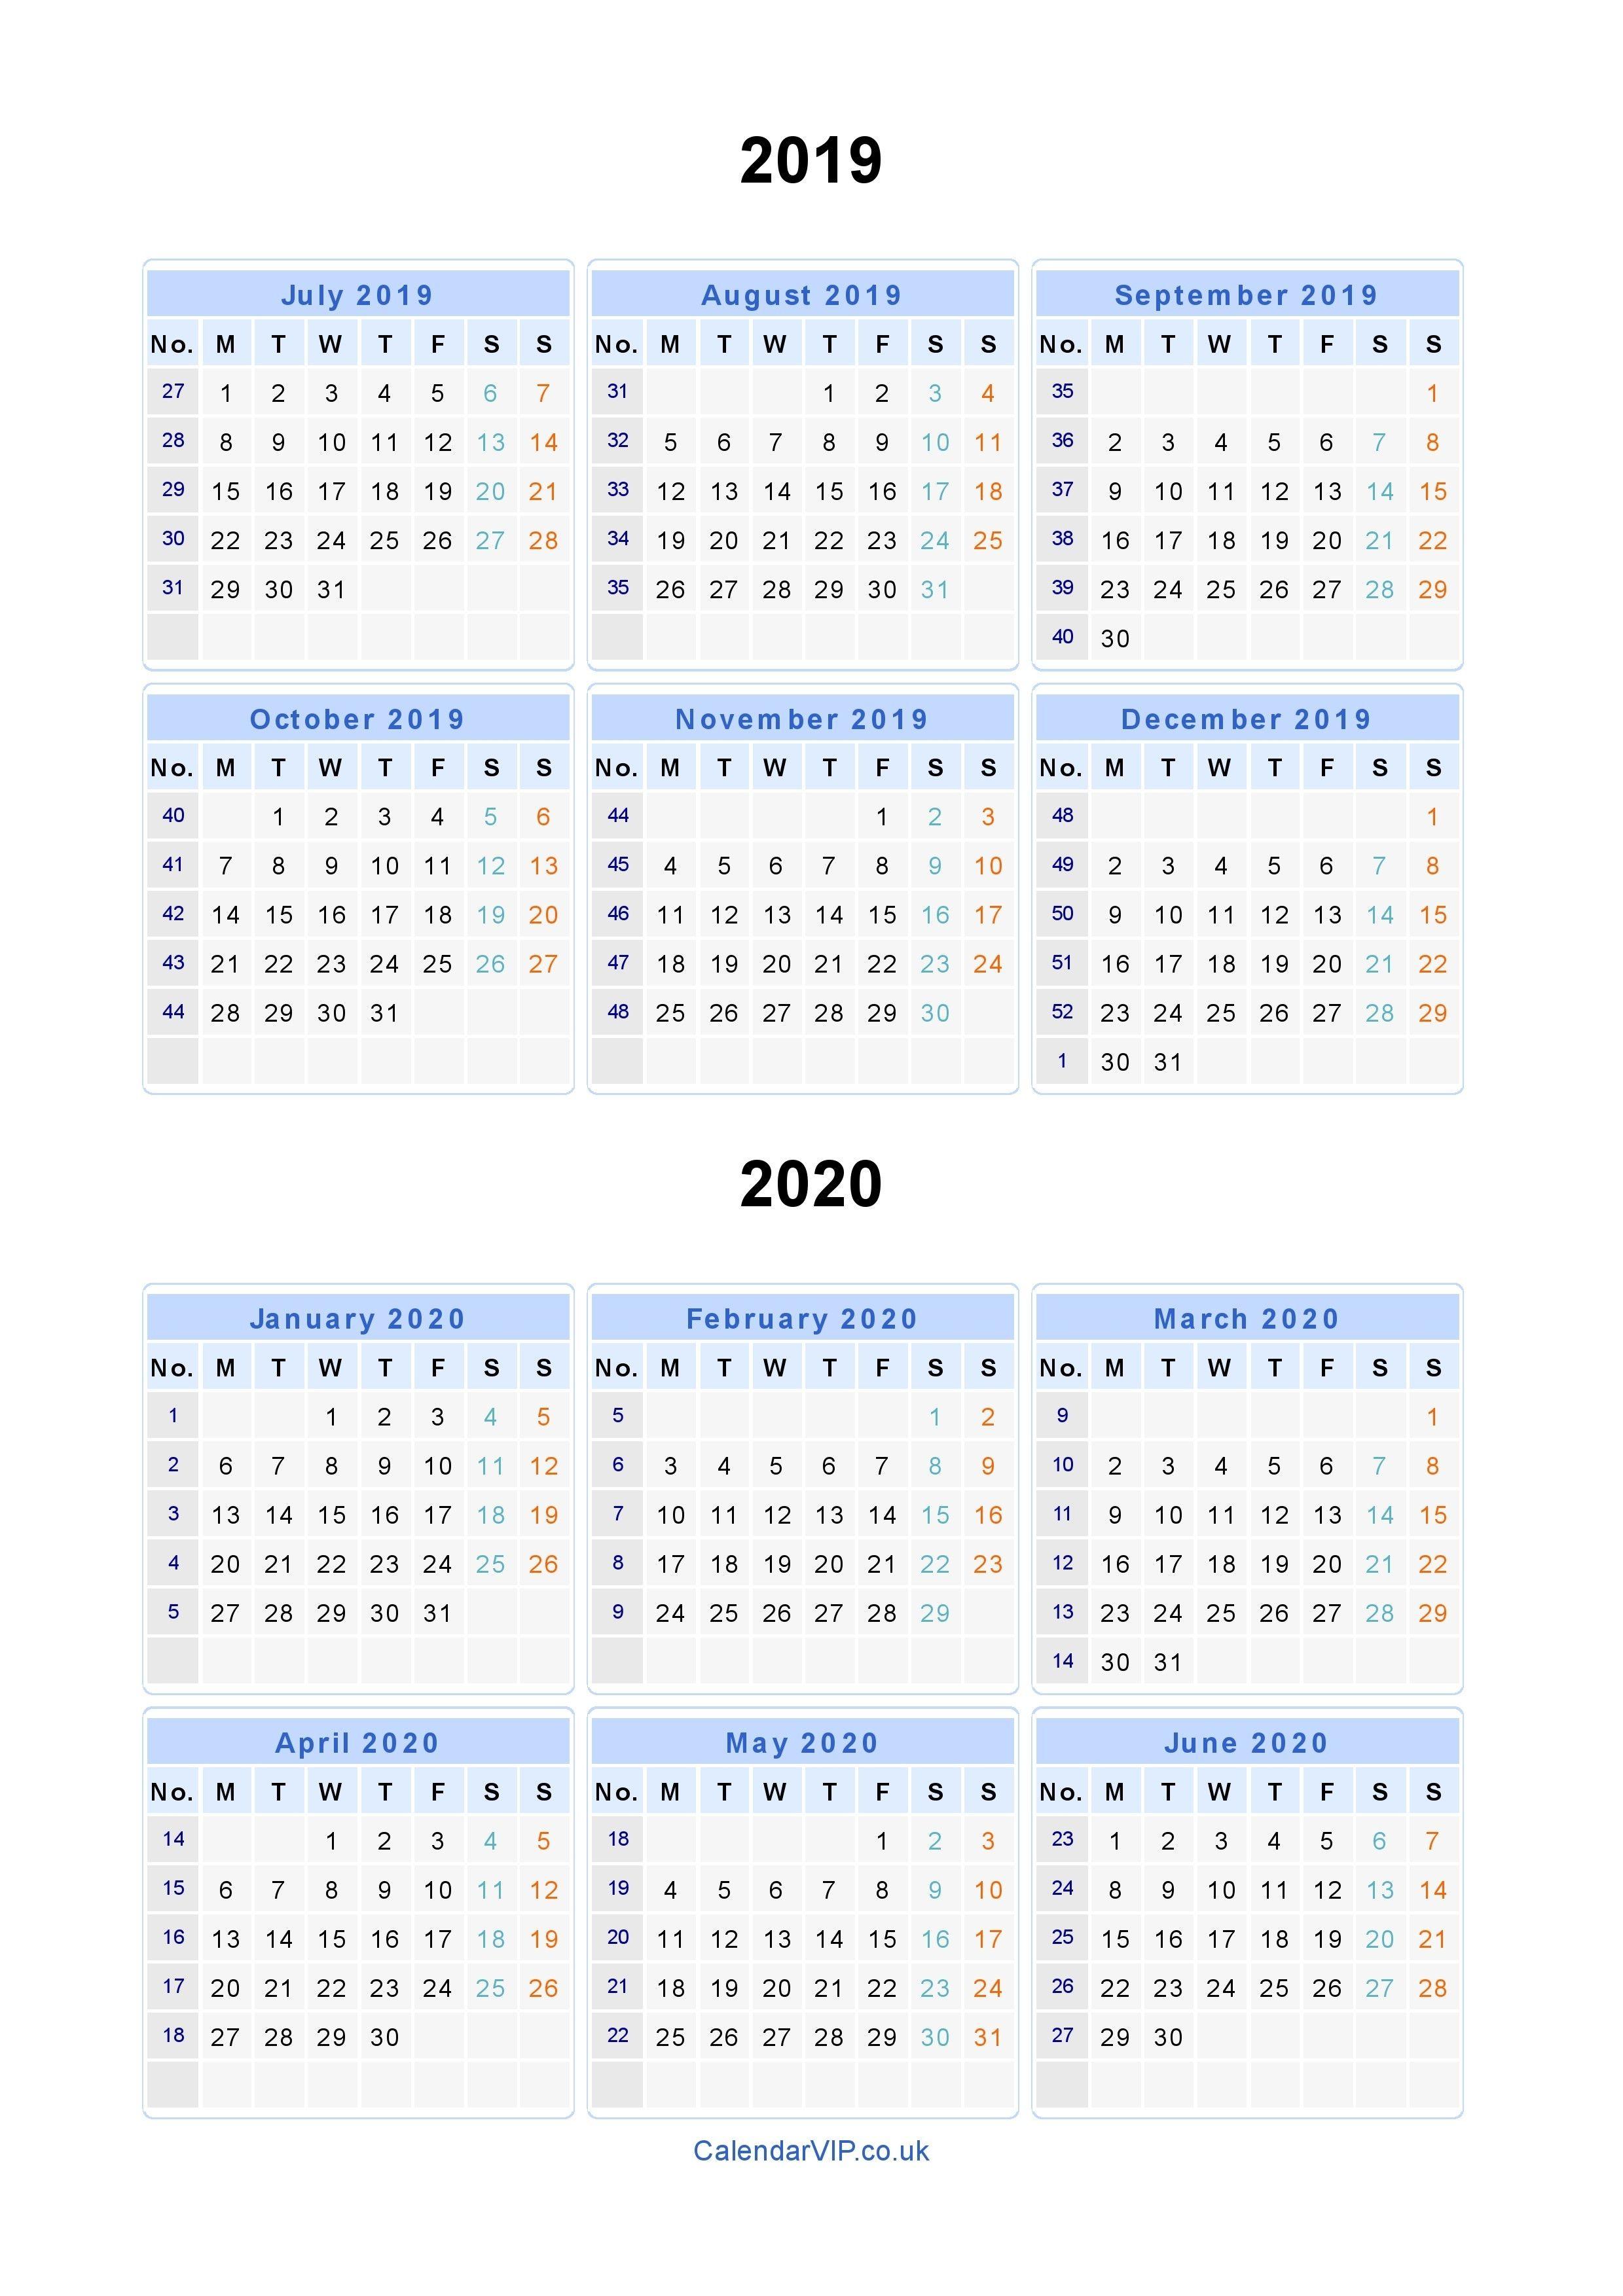 2020 2020 School Calendar Template - Wpa.wpart.co